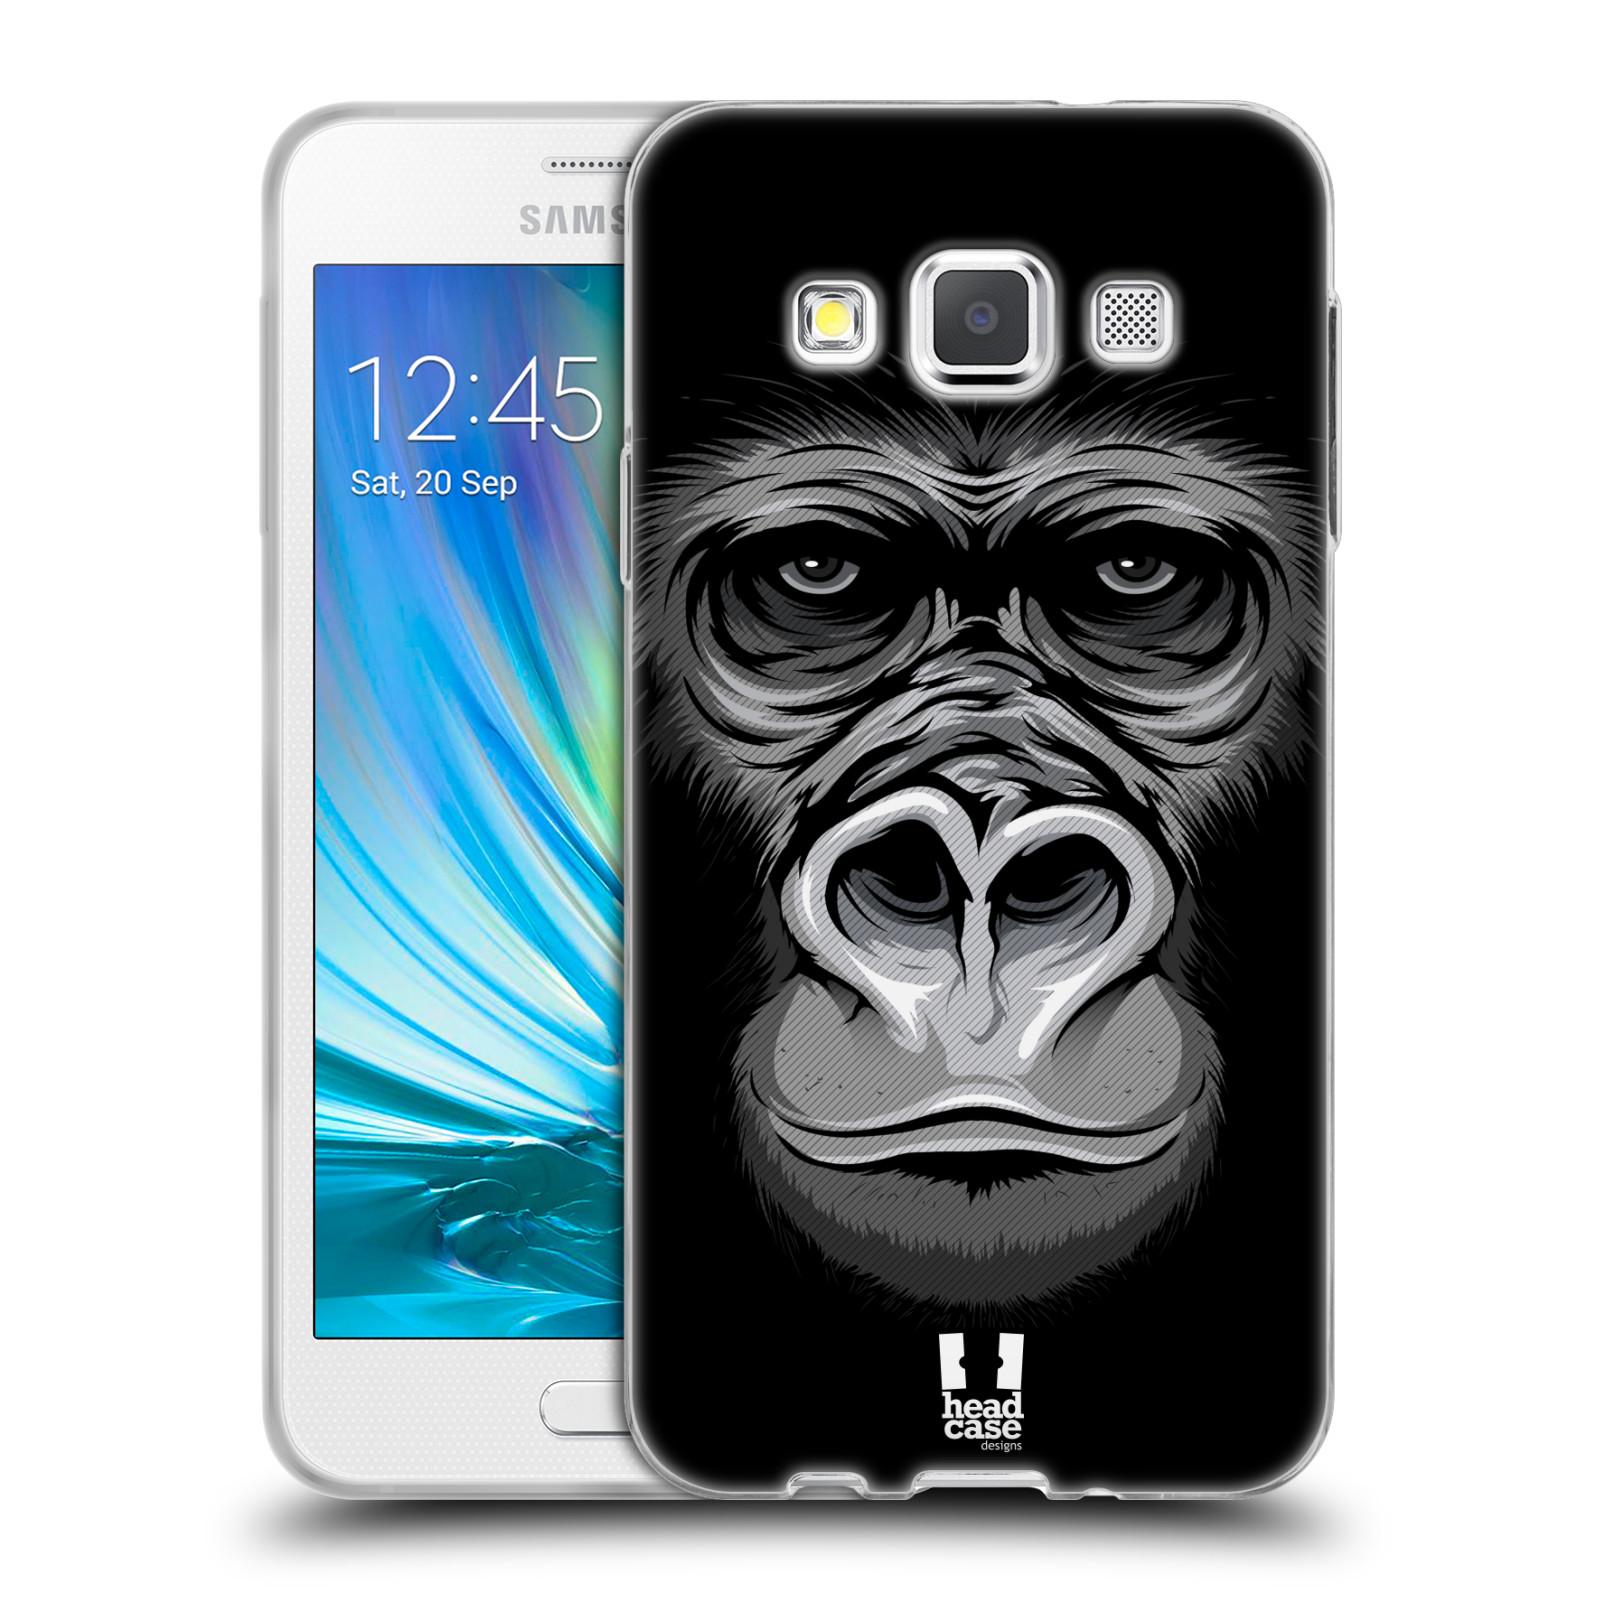 HEAD CASE silikonový obal na mobil Samsung Galaxy A3 vzor Zvíře kreslená tvář 2 gorila